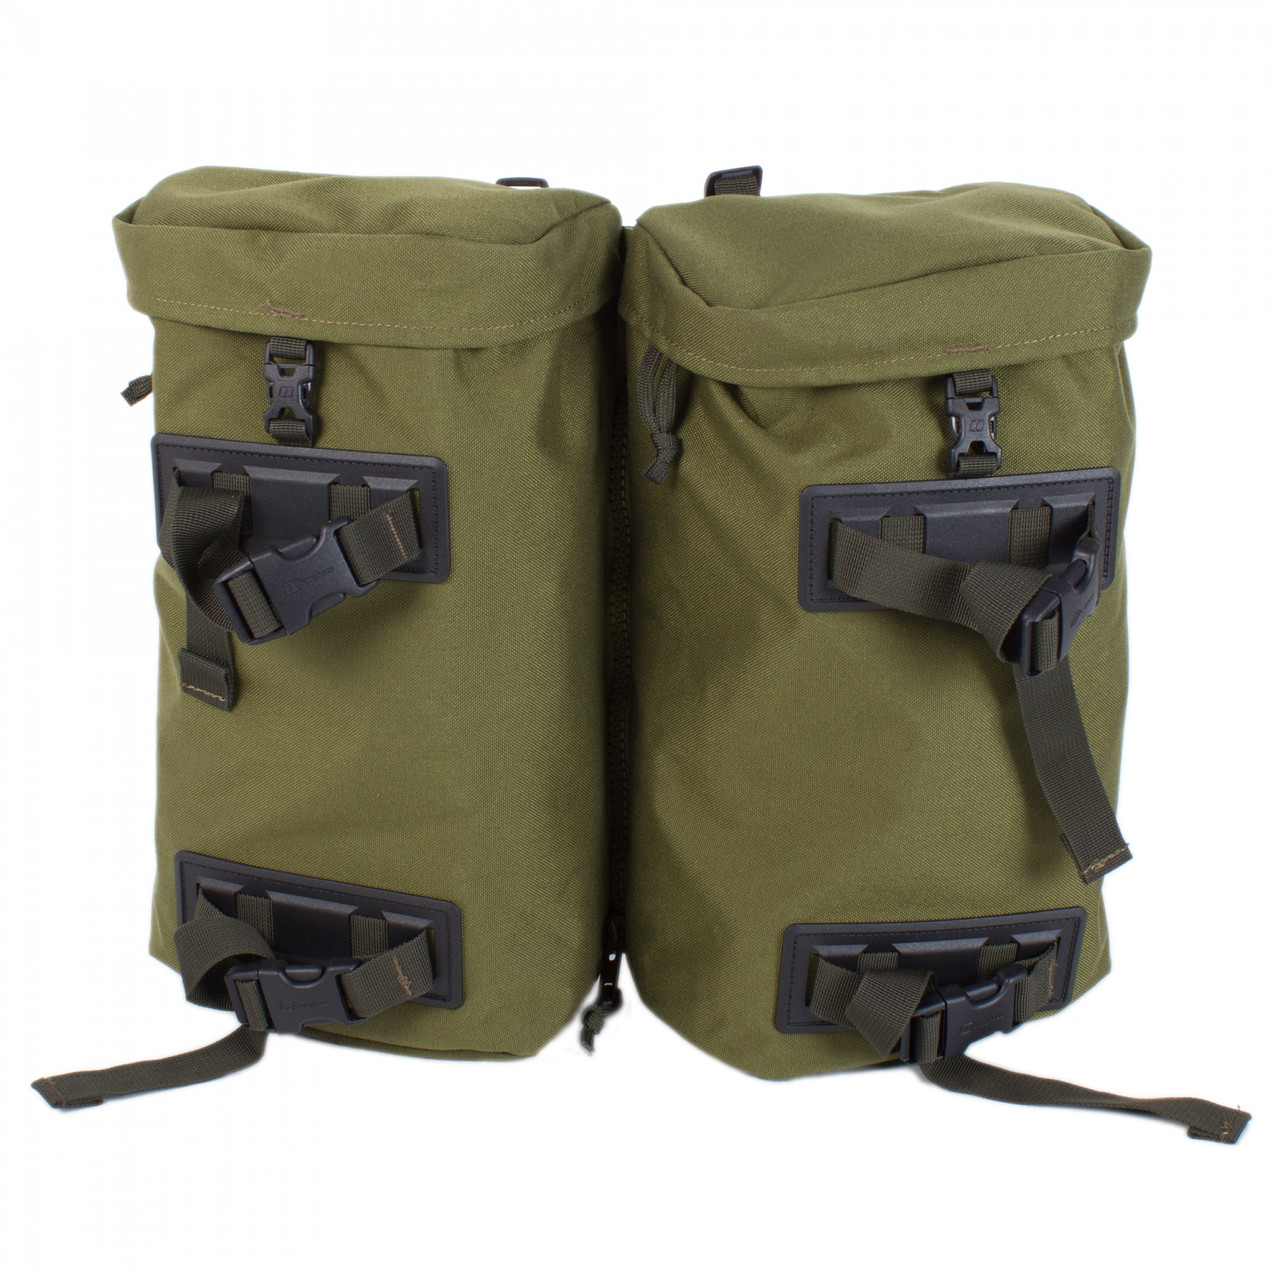 Berghaus MMPS Pockets II 2x Oliv 10 l Front